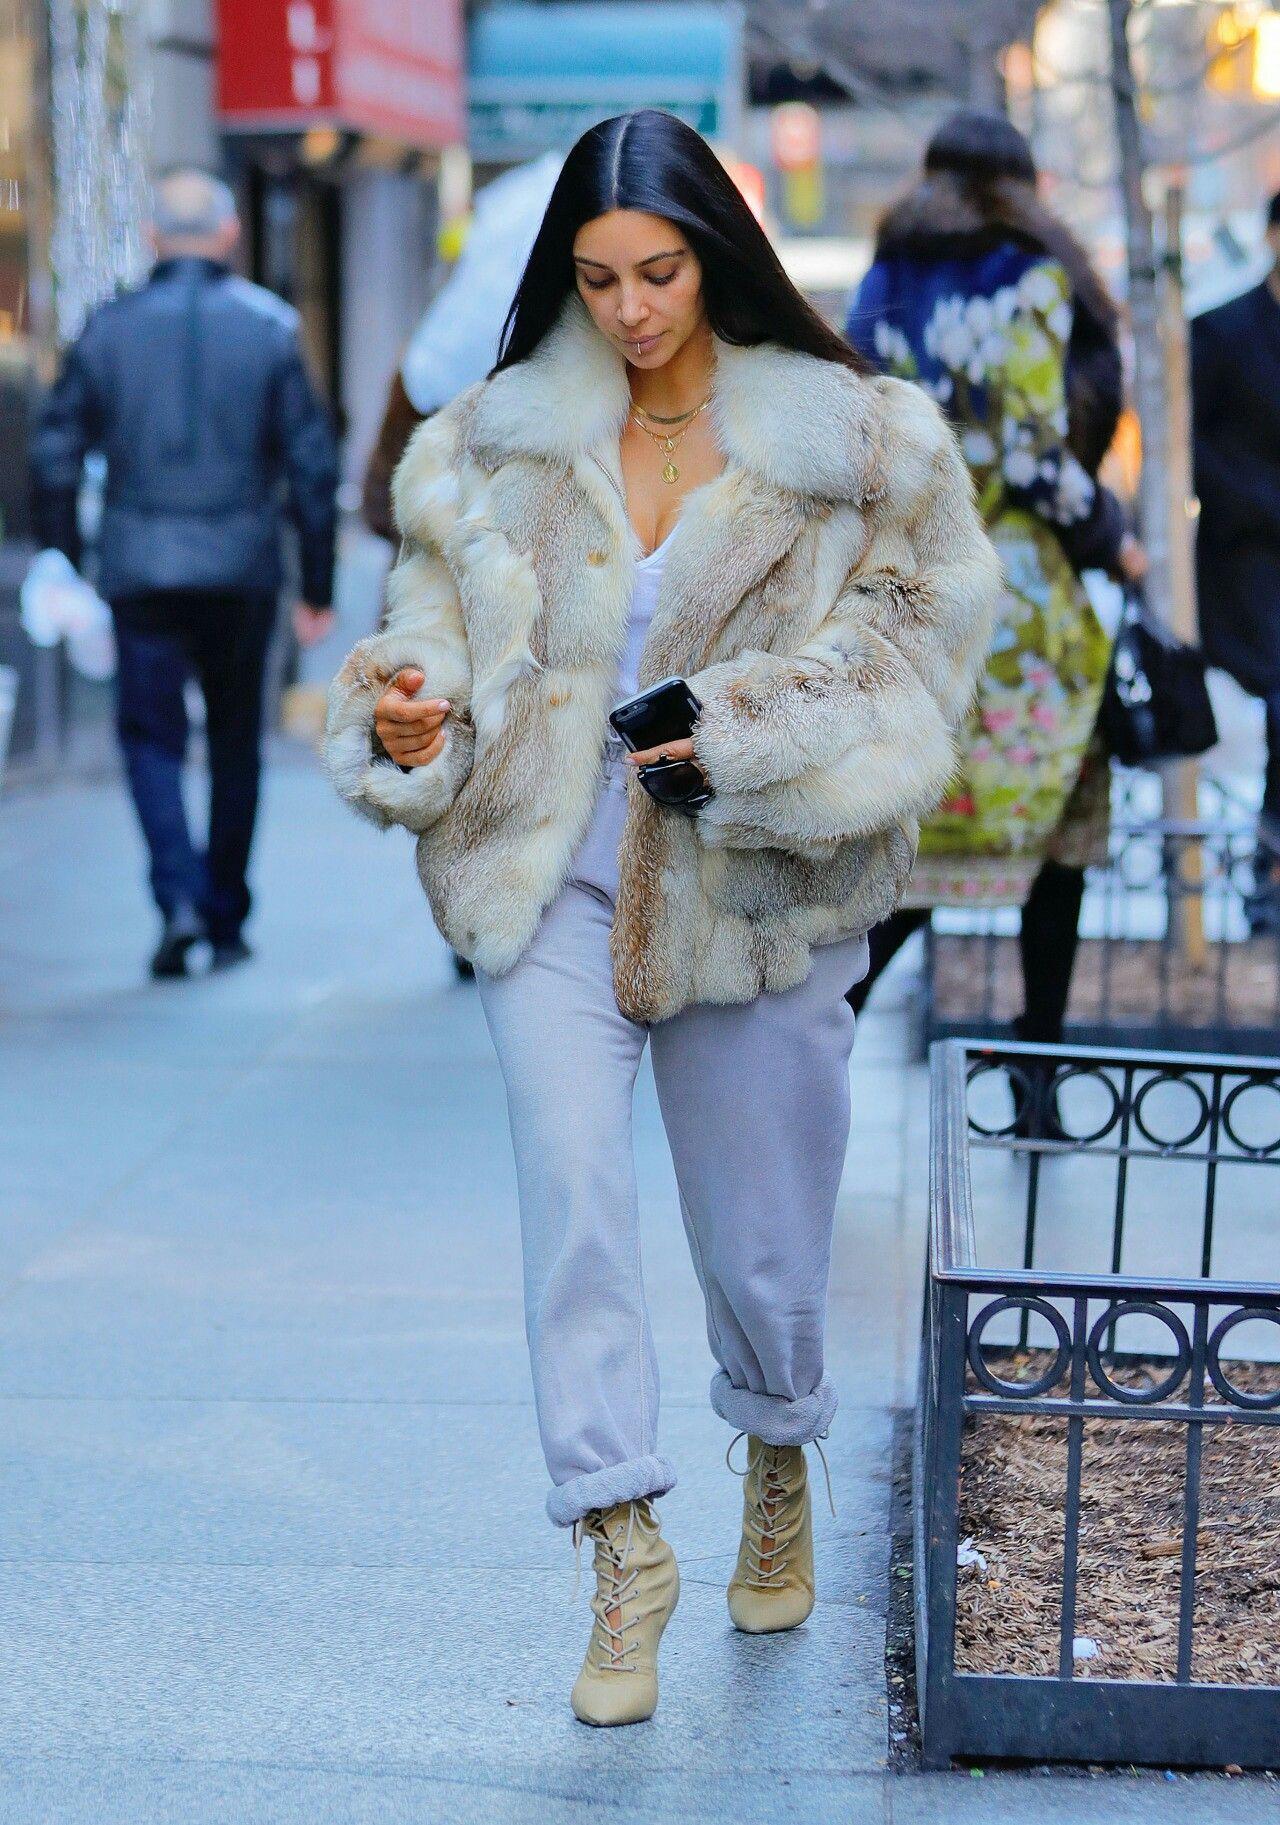 Kim Kardashian out in NYC / january 16, 2017 | Kim Kardashian ...